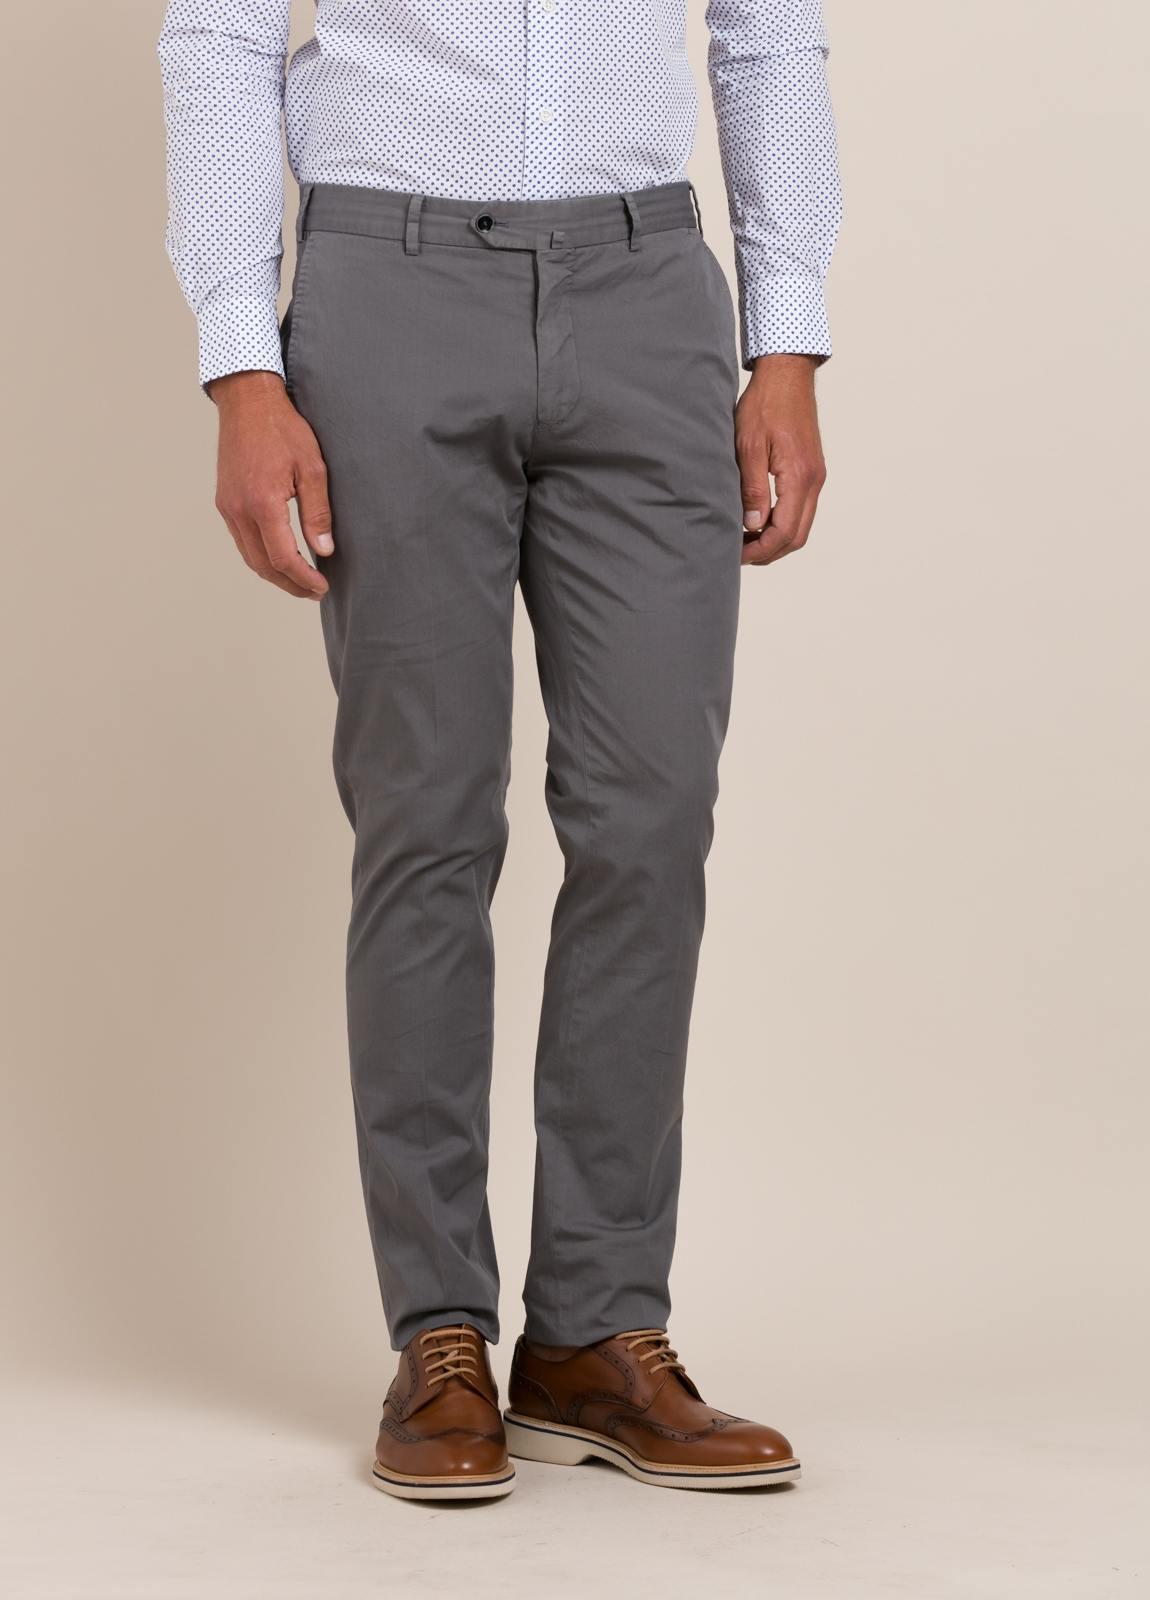 Pantalón chino FUREST COLECCIÓN Slim Fit gris - Ítem2